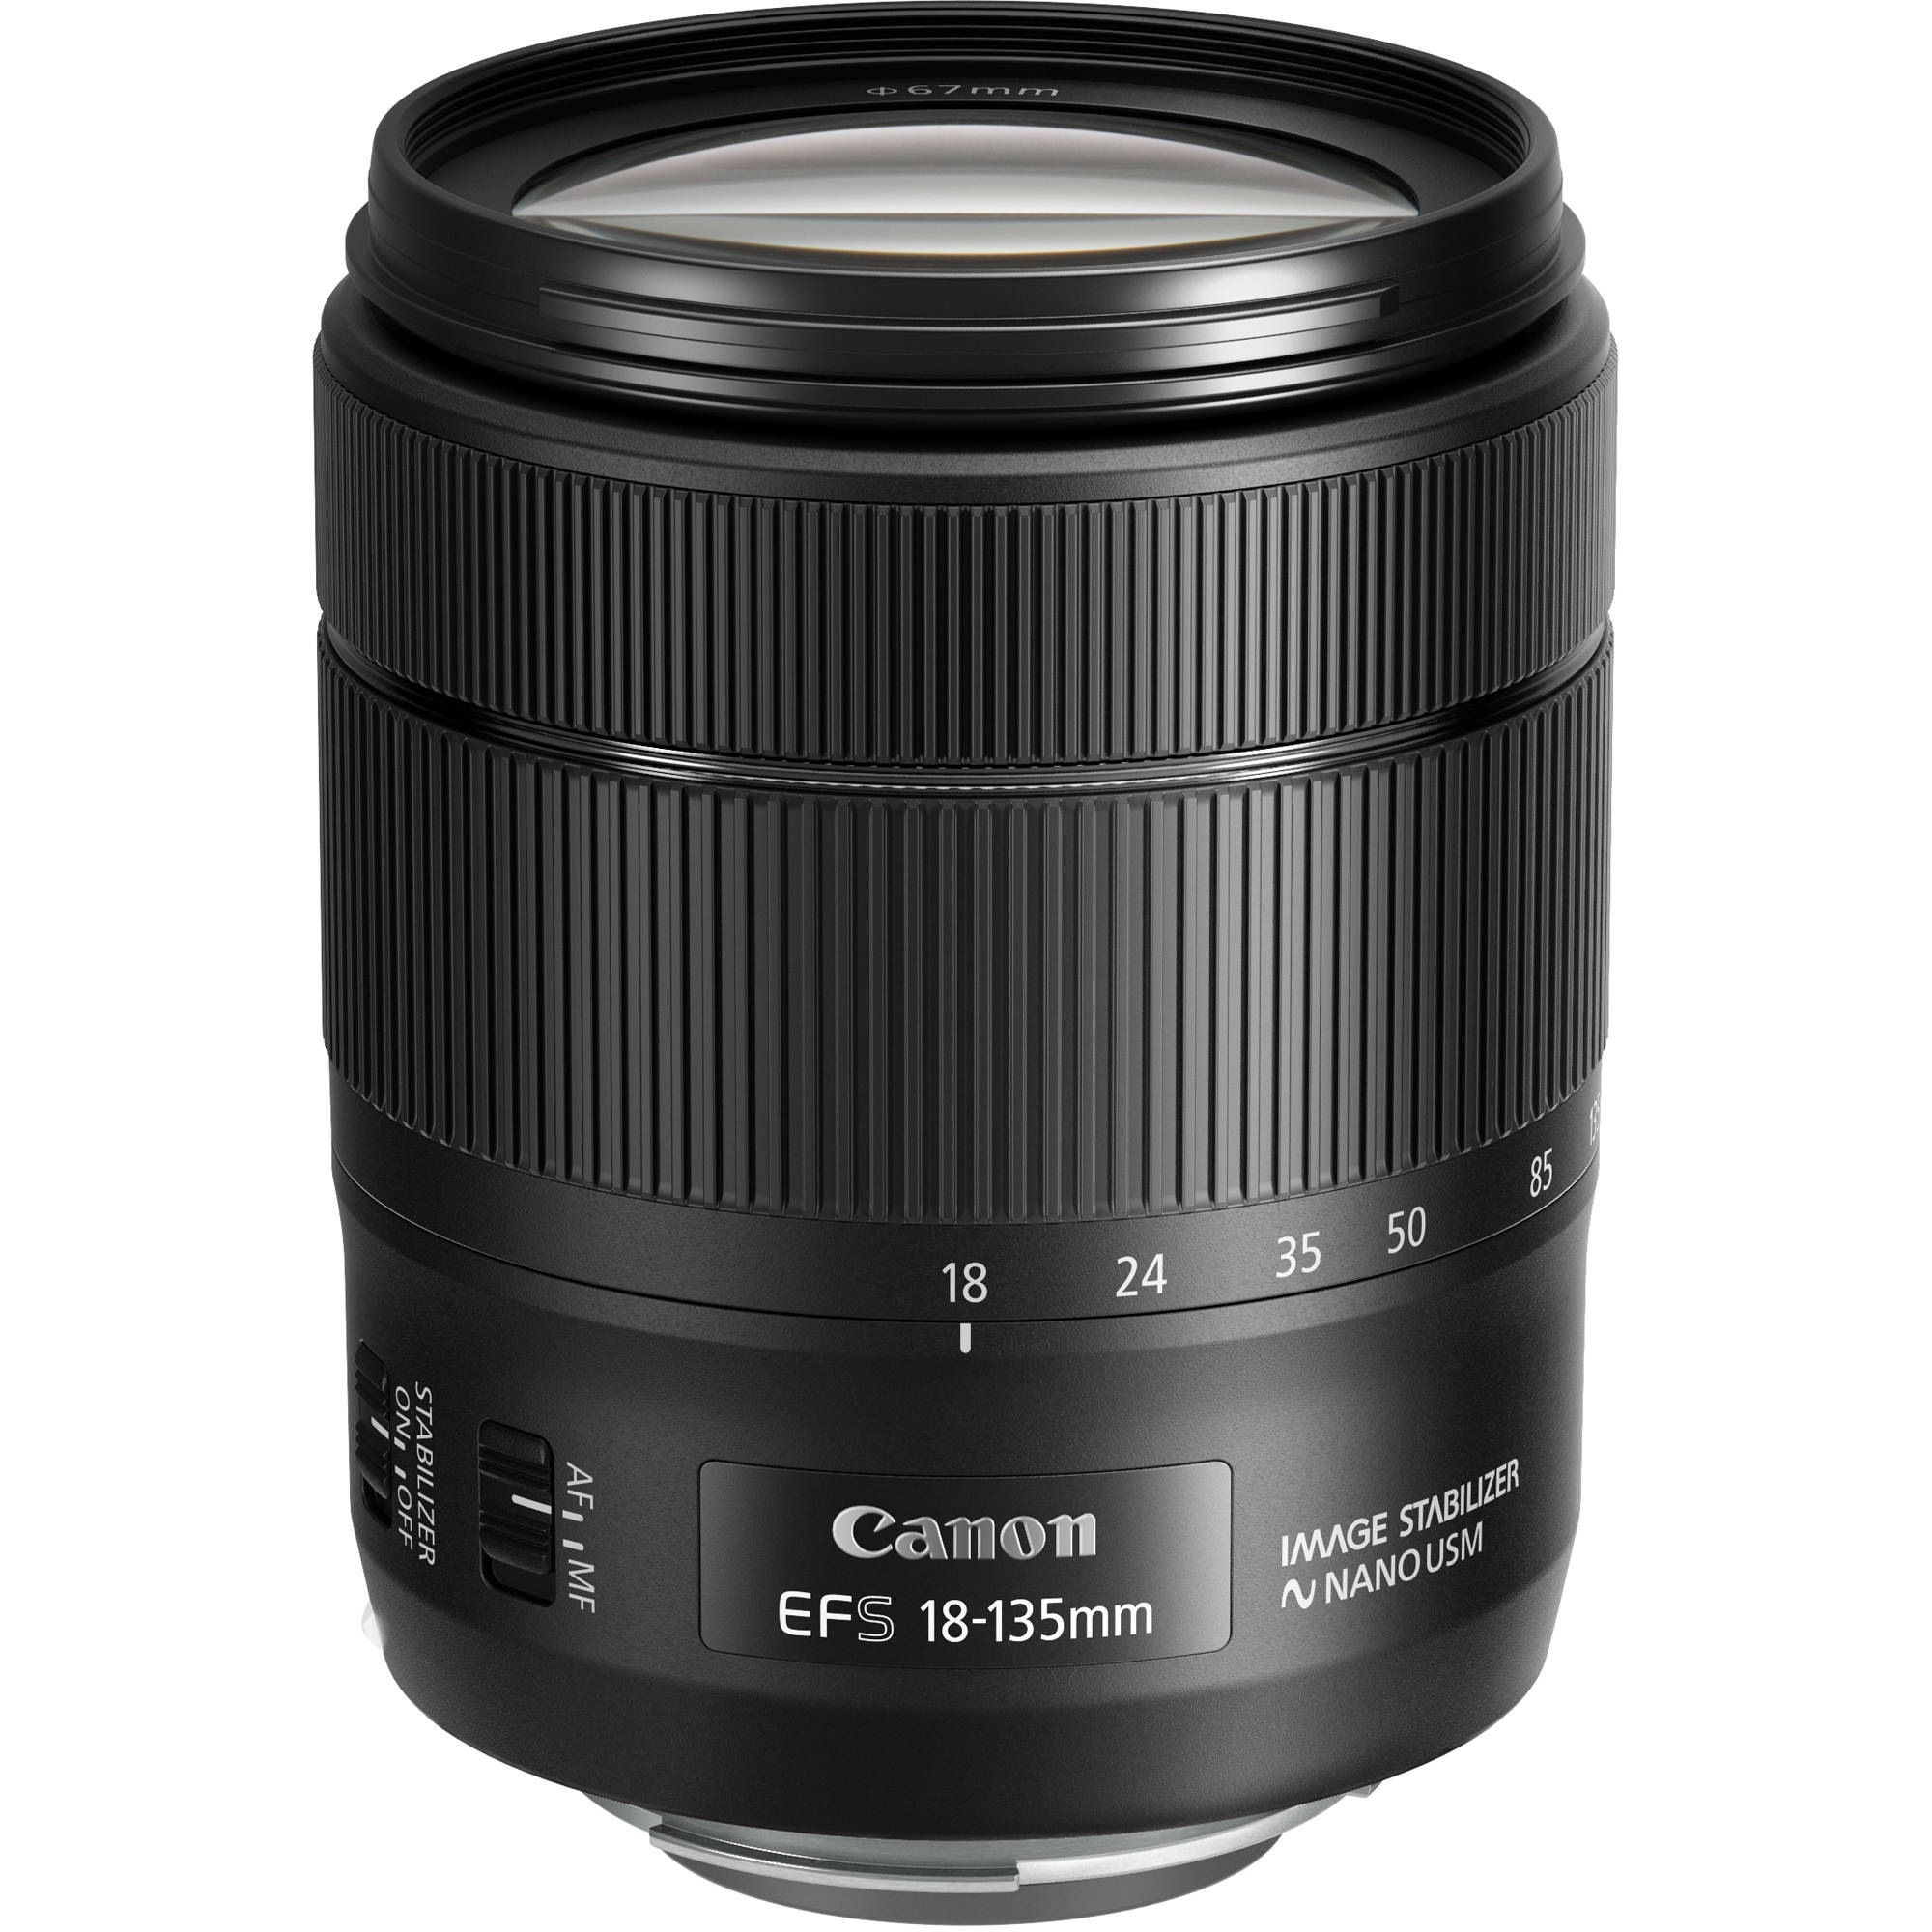 canon ef s 18 135mm f 3 5 5 6 is usm lens 1276c002 b h photo. Black Bedroom Furniture Sets. Home Design Ideas